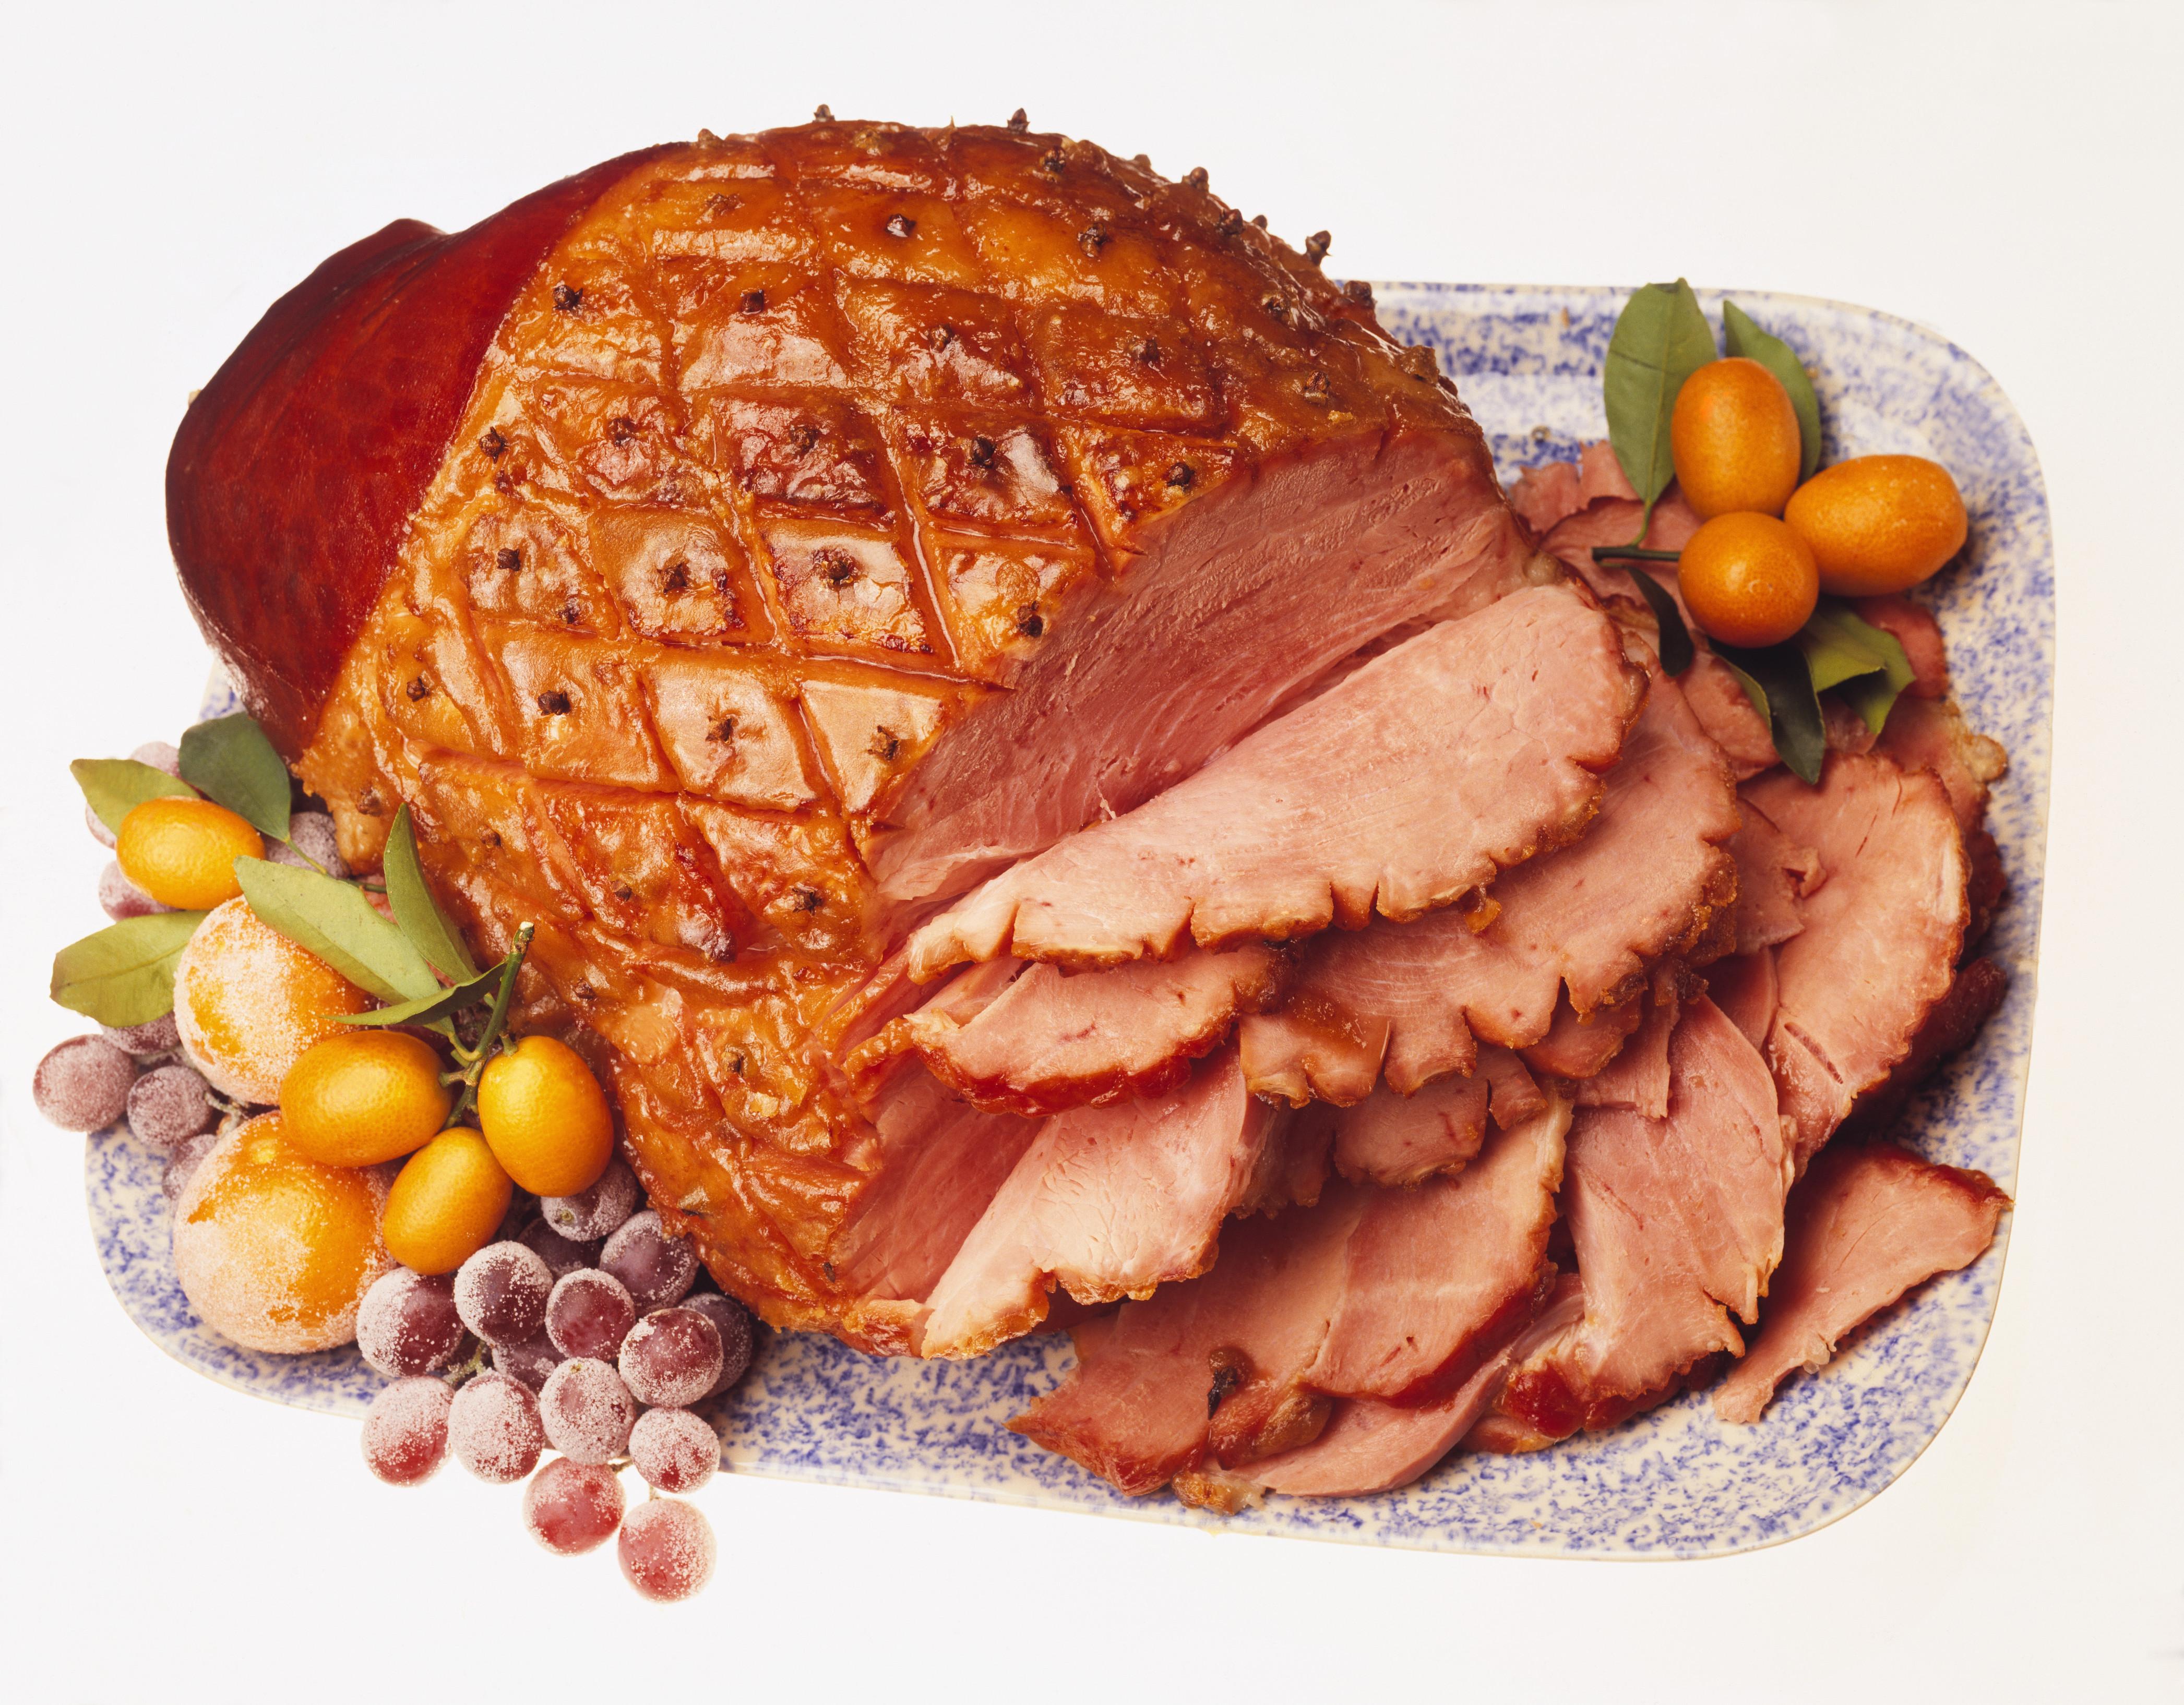 Easter Ham Recipes  Baked Easter Ham Recipe — Dishmaps